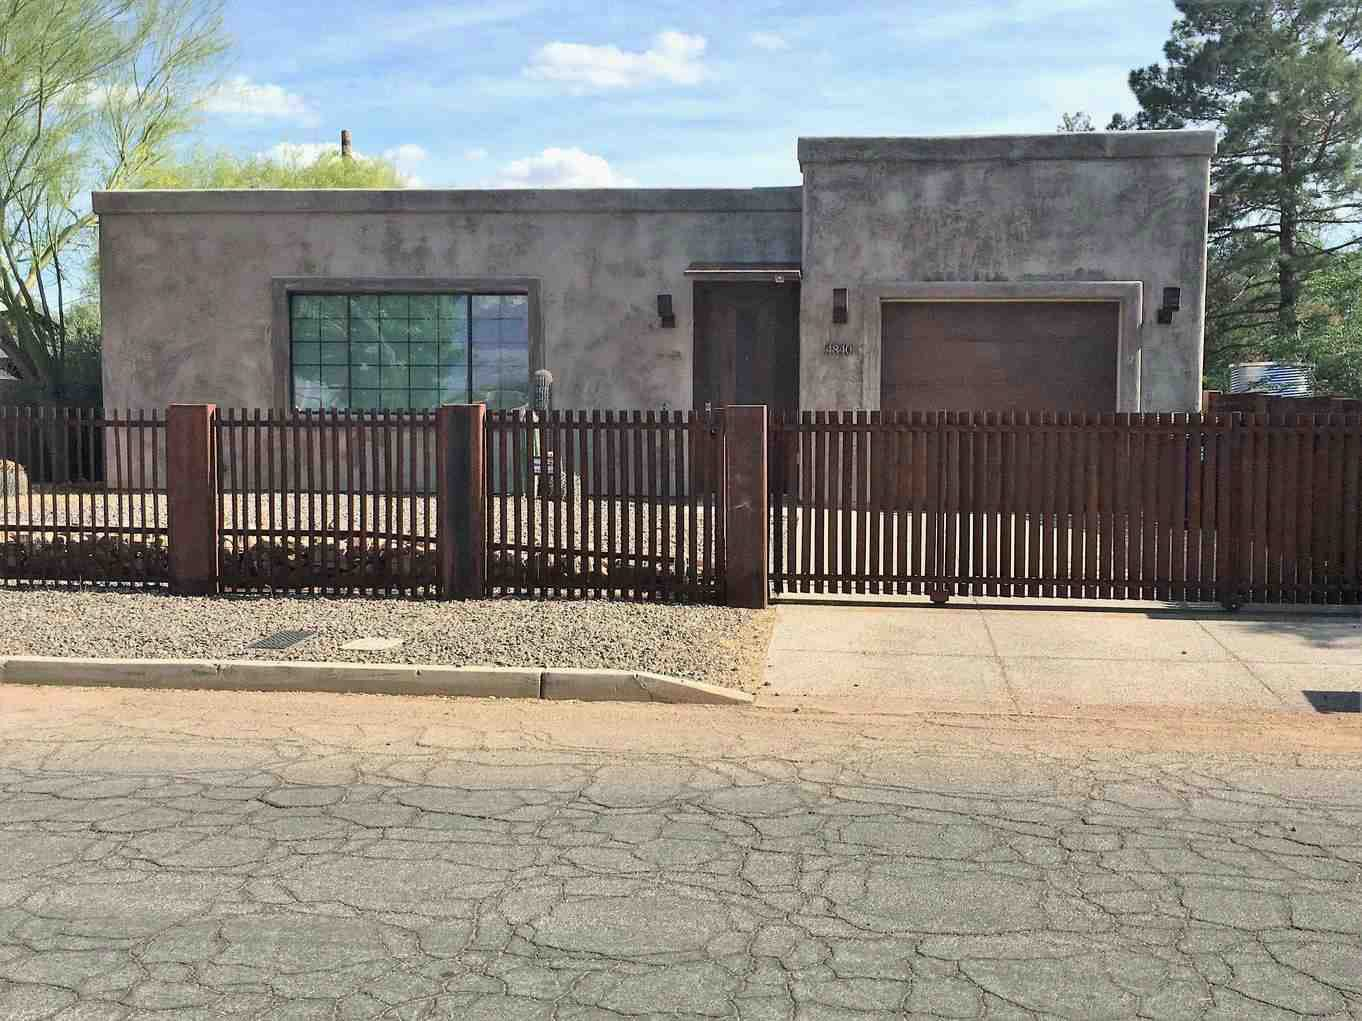 Live Auction: Single Family Home (4840 E. 1st Street) In Tucson, AZ